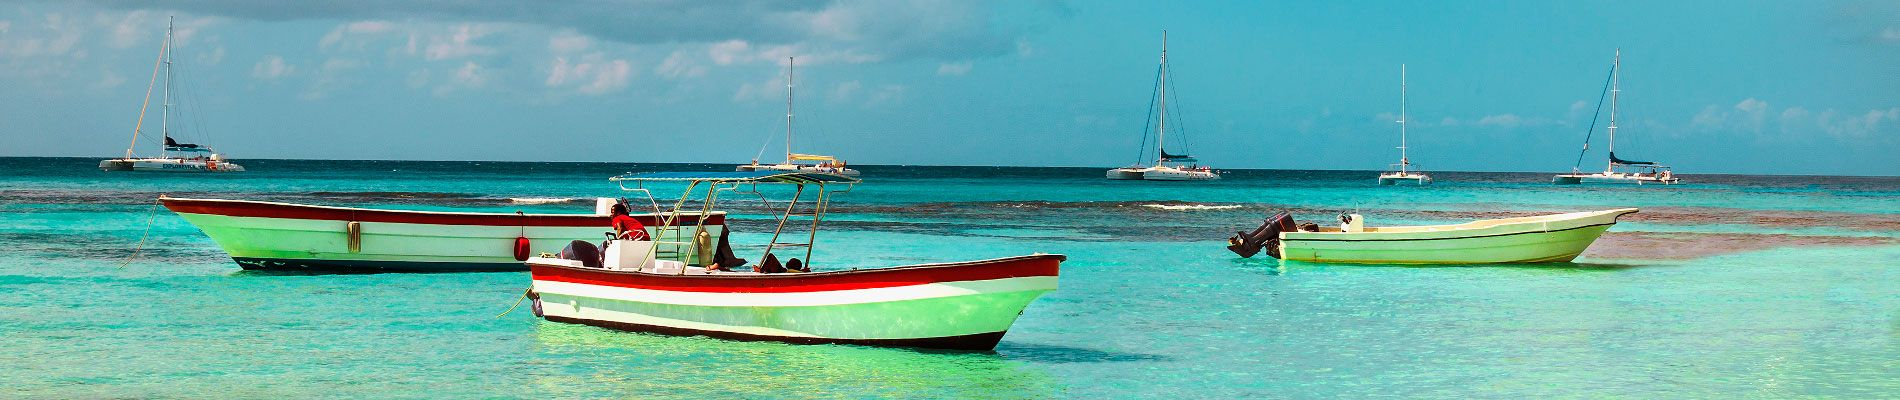 panama-bateau-plage-st